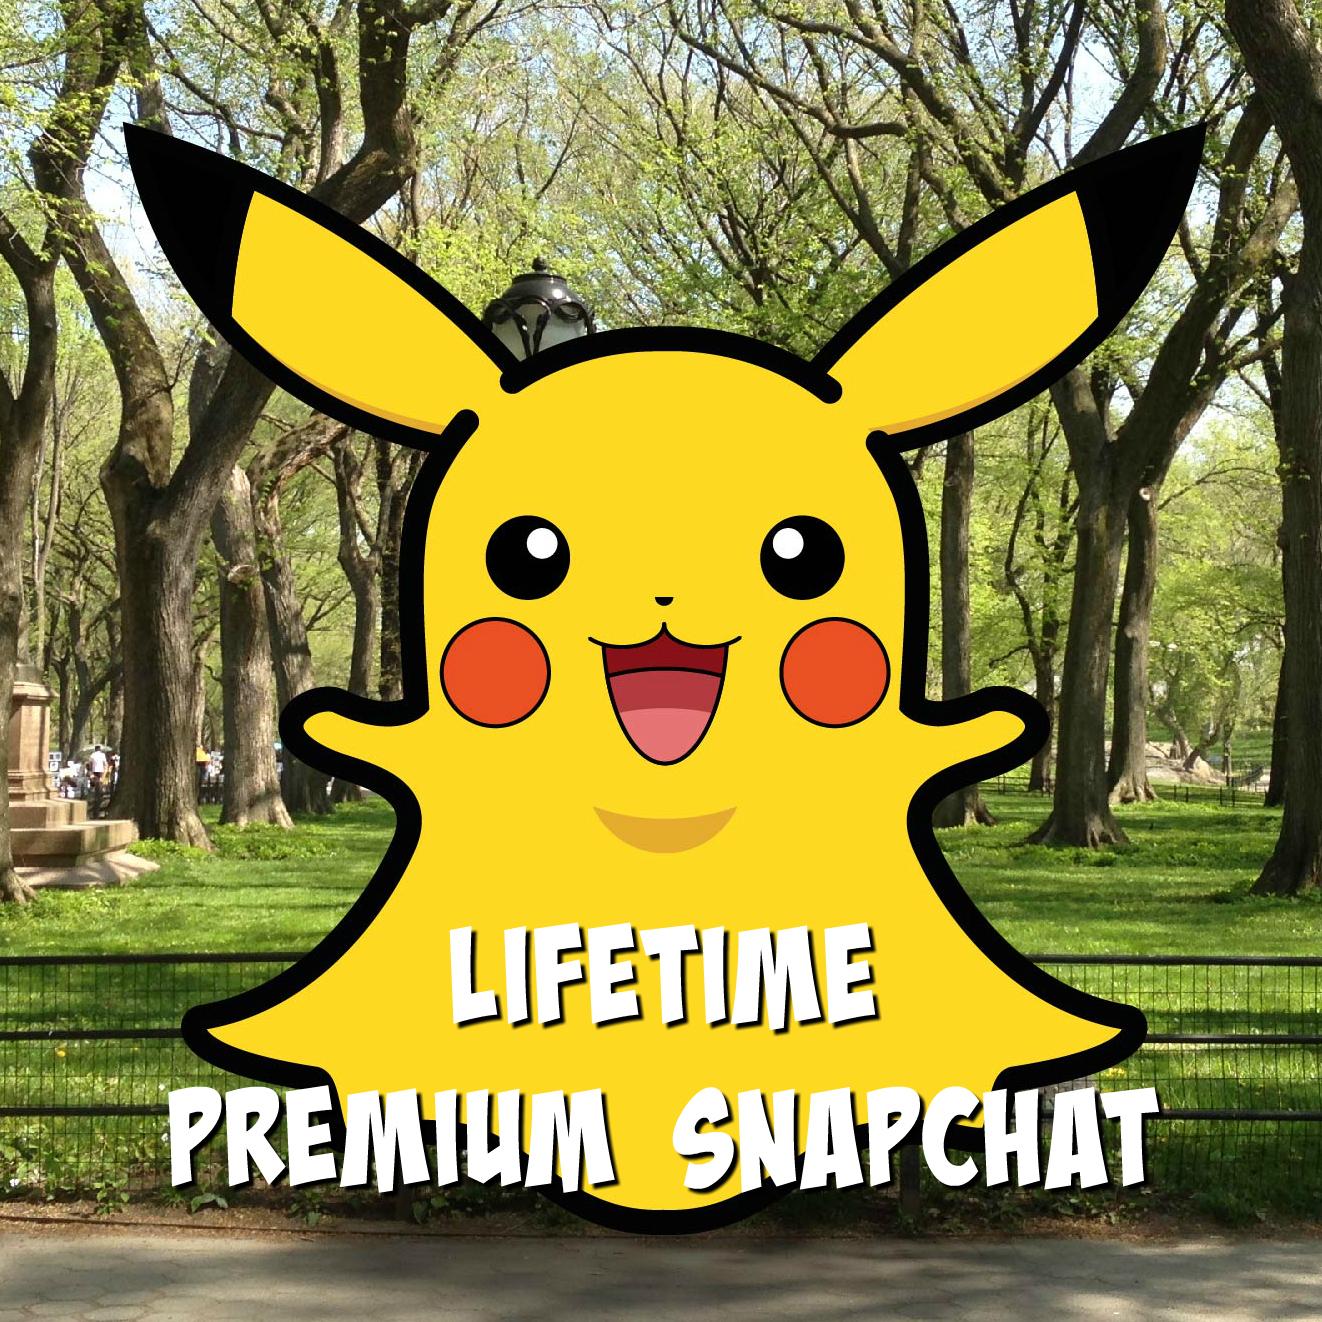 premiumsnapchat